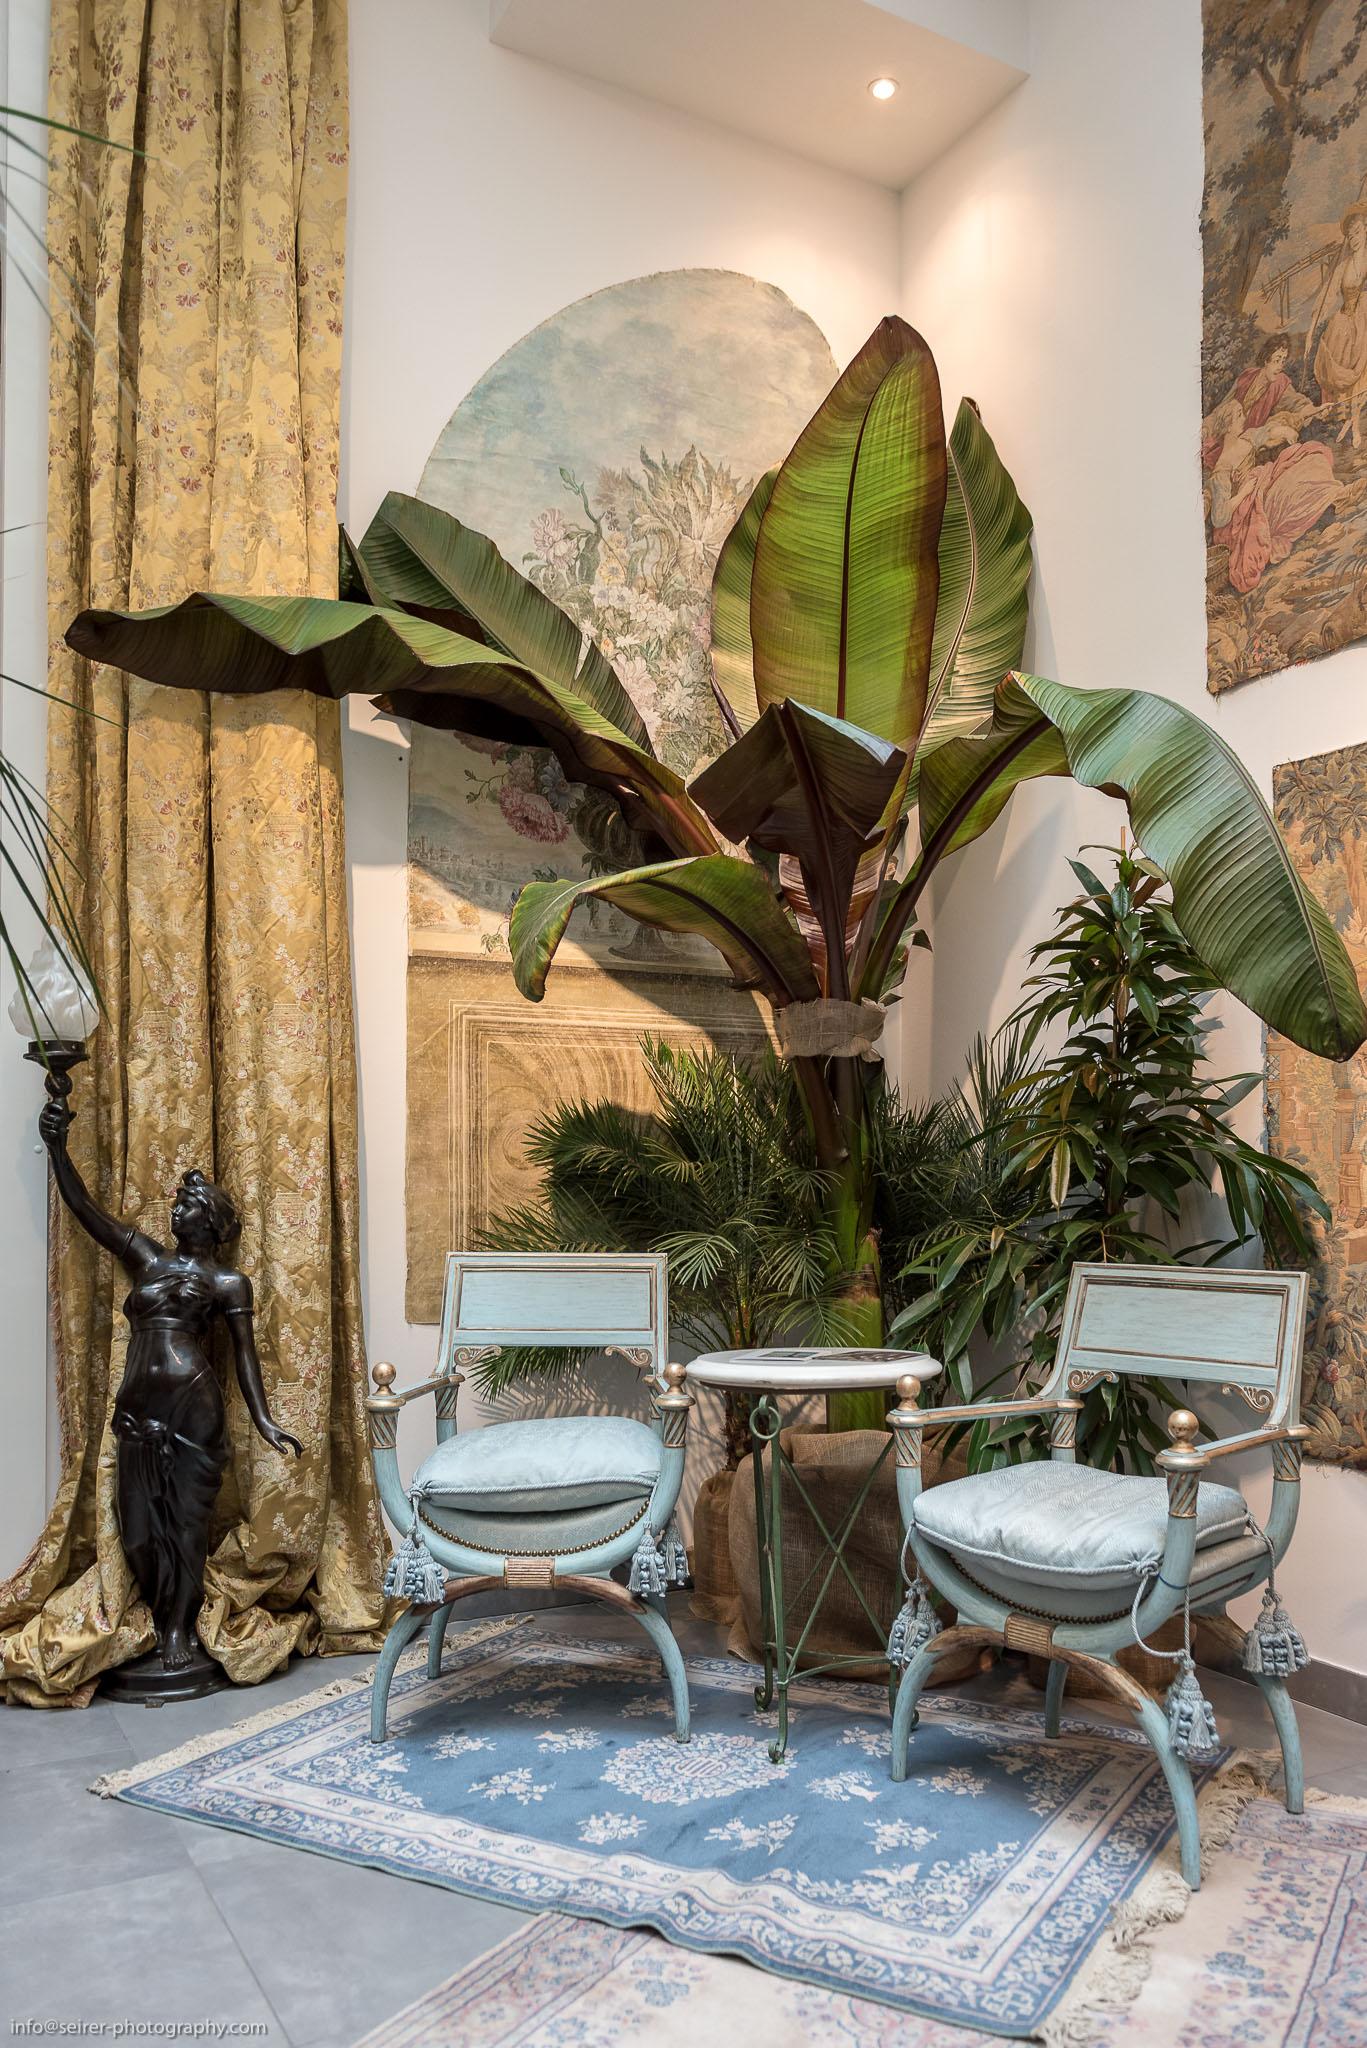 Hotel Ritz: Own The Legend